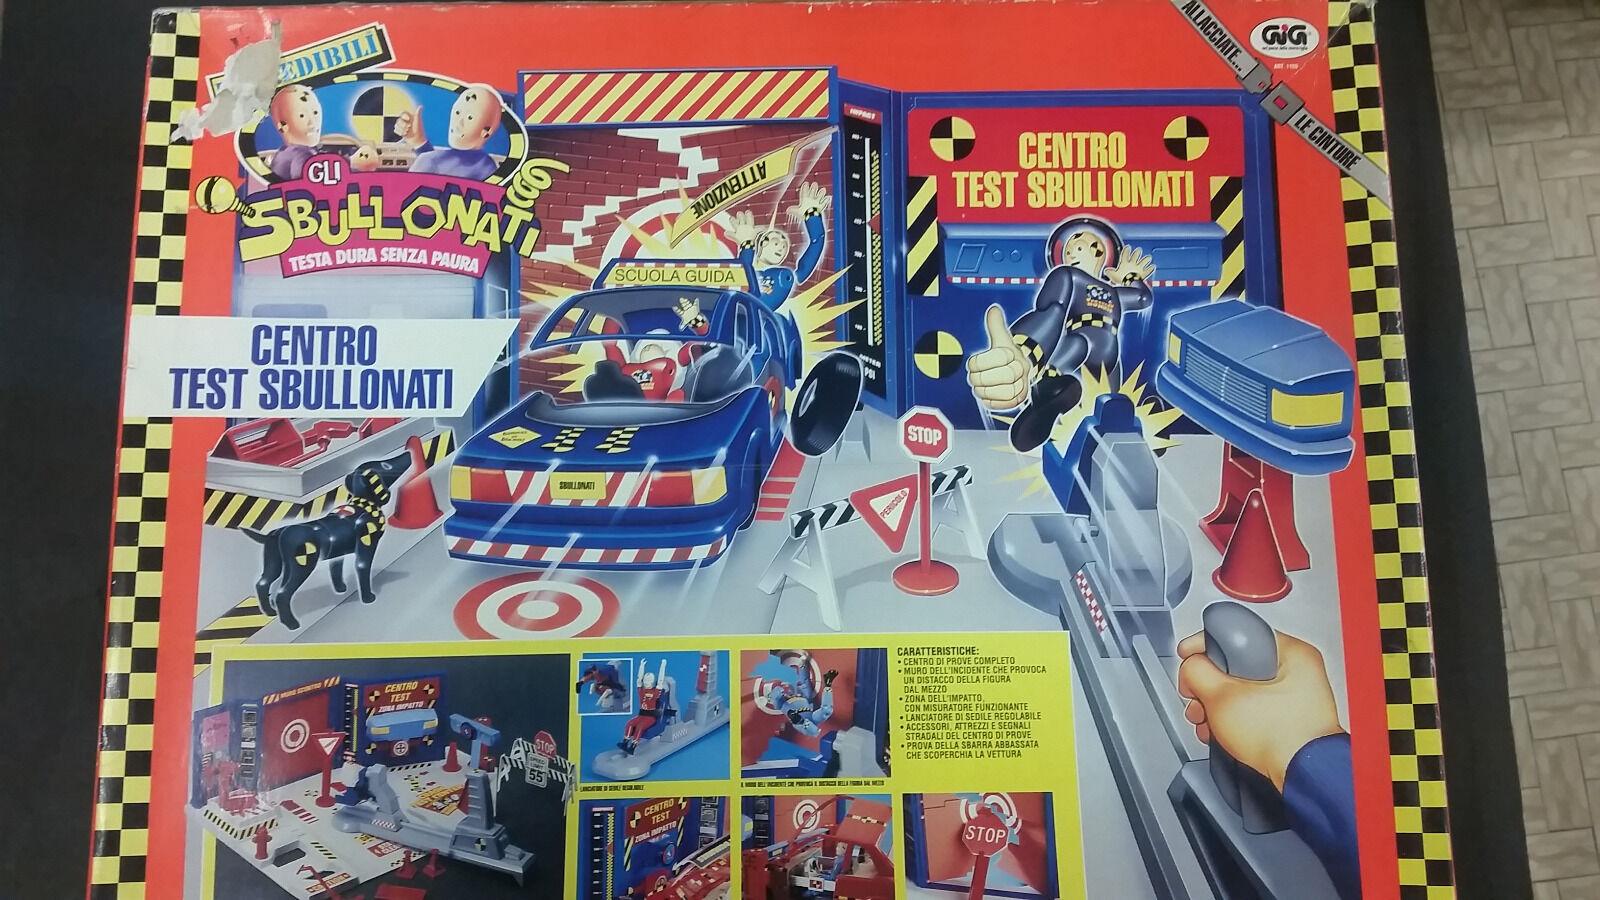 GIG CENTRO TEST SBULLONATI - 1991